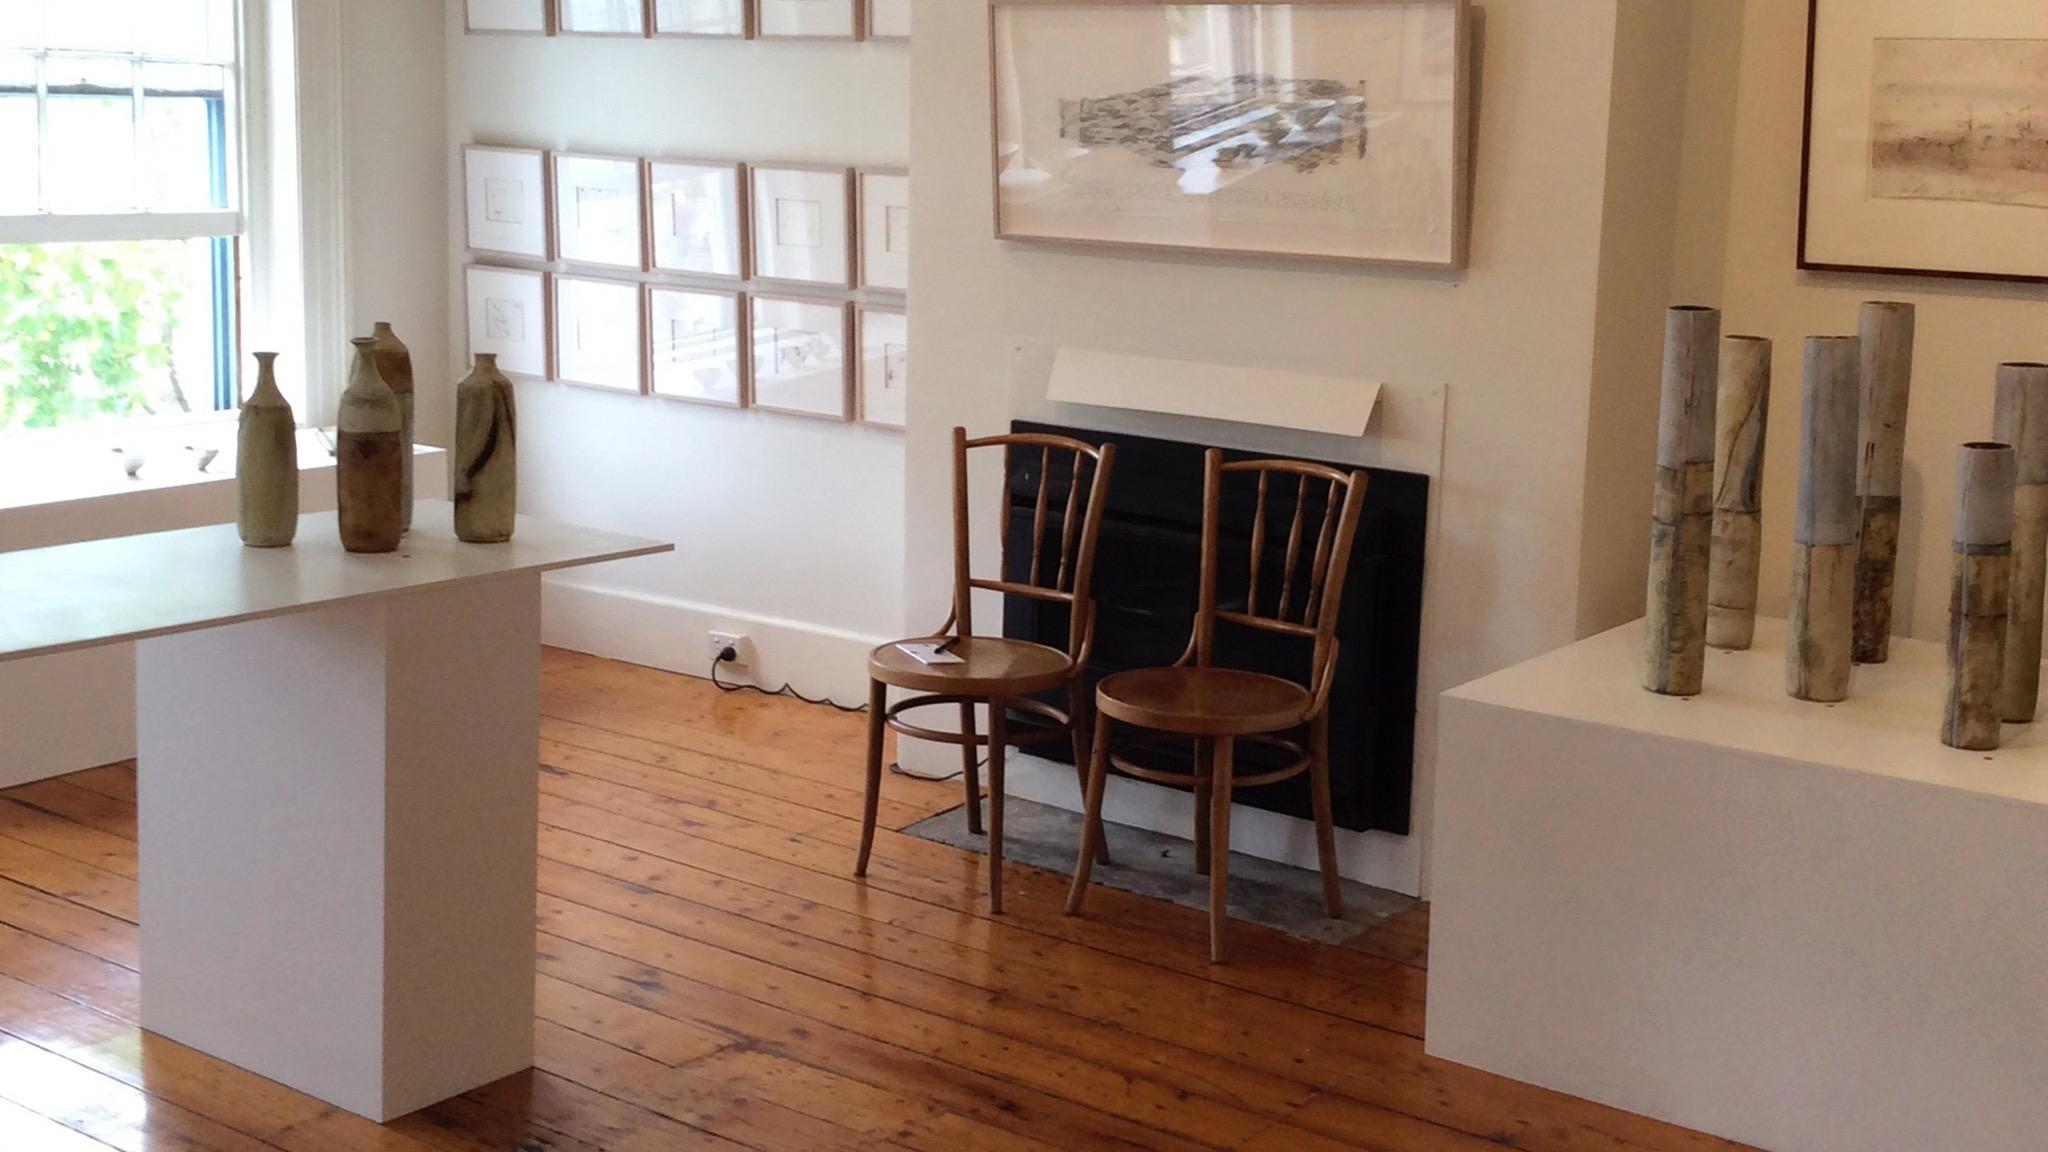 Upstairs gallery: Ceramics by Sarah Ormonde, Drawings by John Wolseley